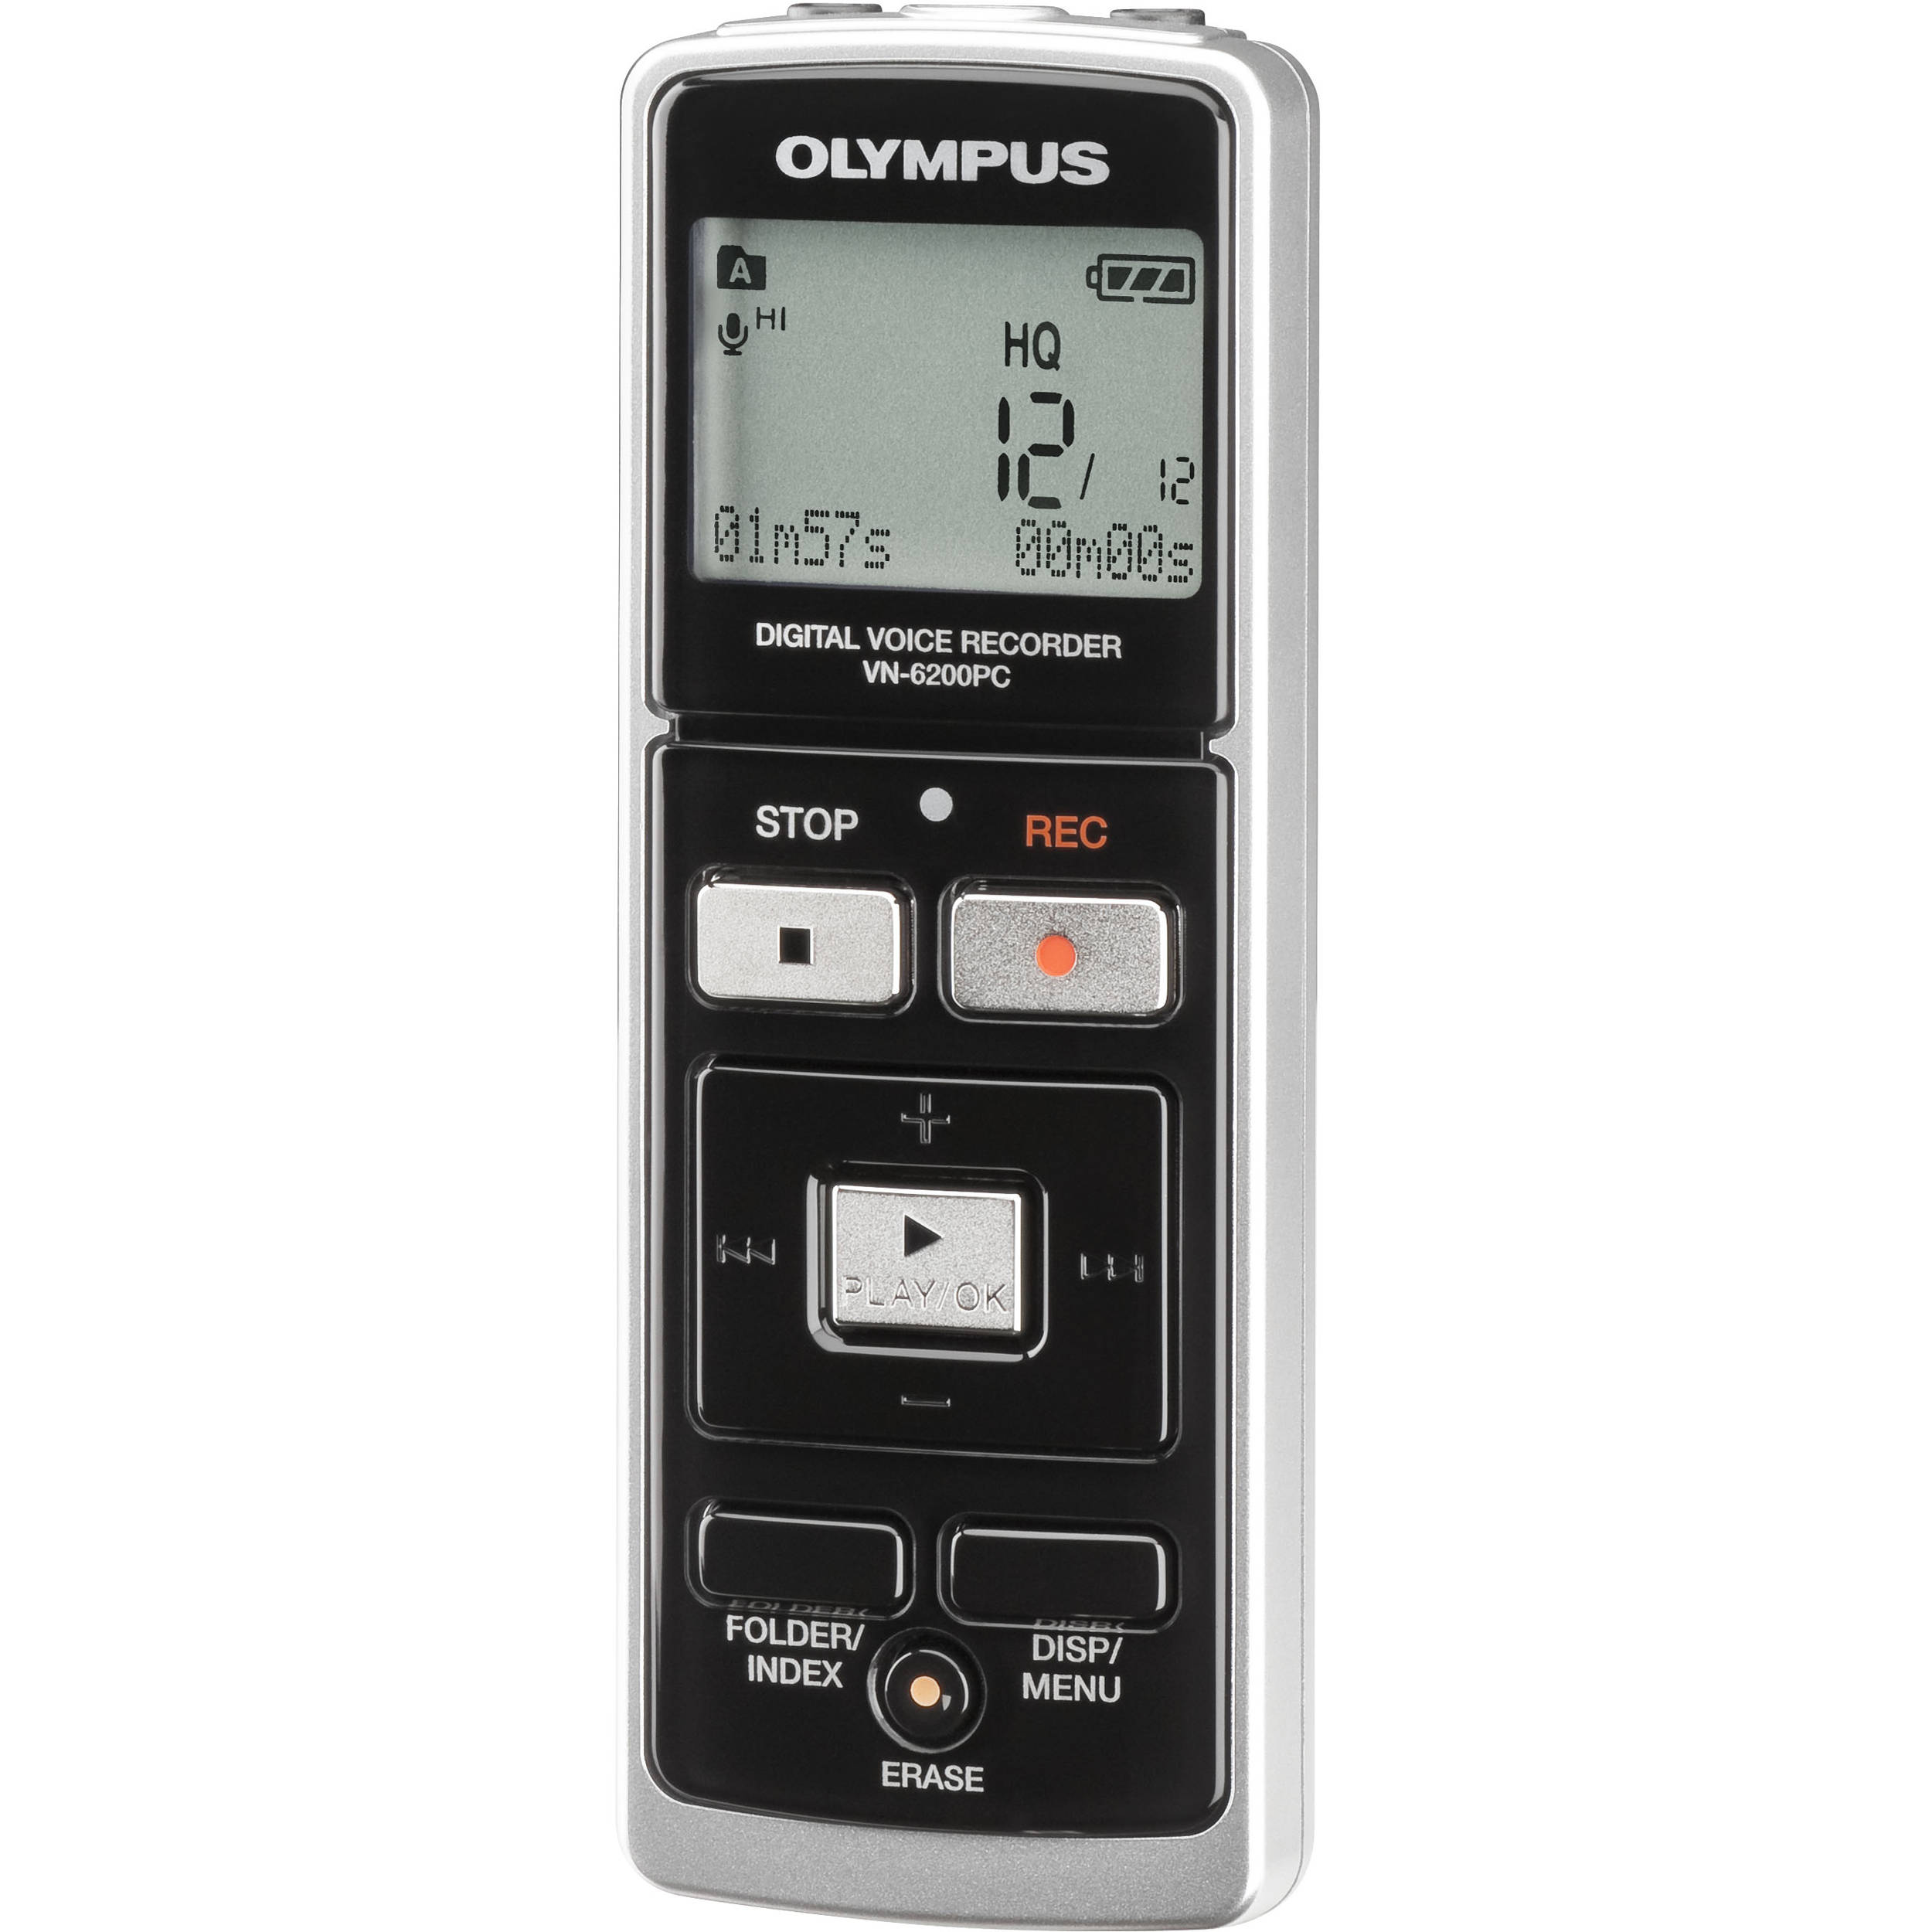 olympus vn 6200pc digital voice recorder 1gb 142070 b h photo rh bhphotovideo com Olympus VN -702PC Voice Recorder digital voice recorder vn 6200pc manual